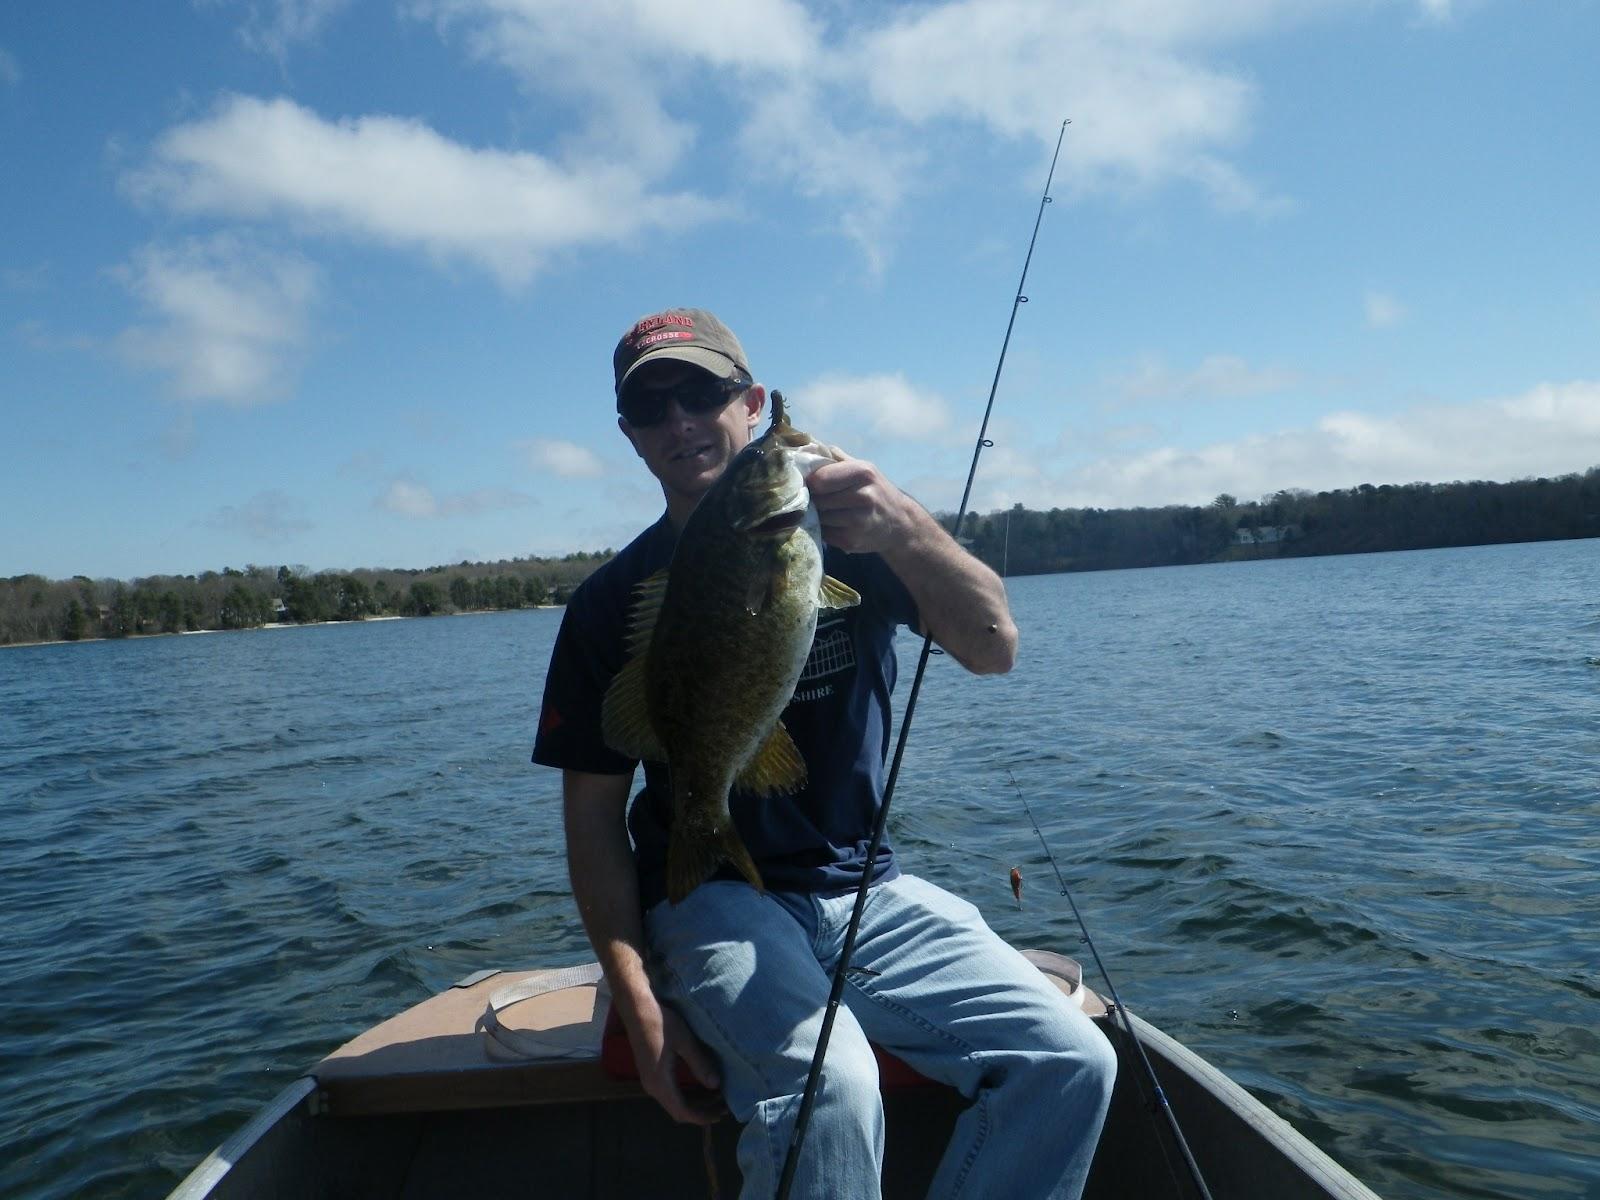 New england striper fishing pre spawn smallmouth bass fishing for Smallmouth bass fishing